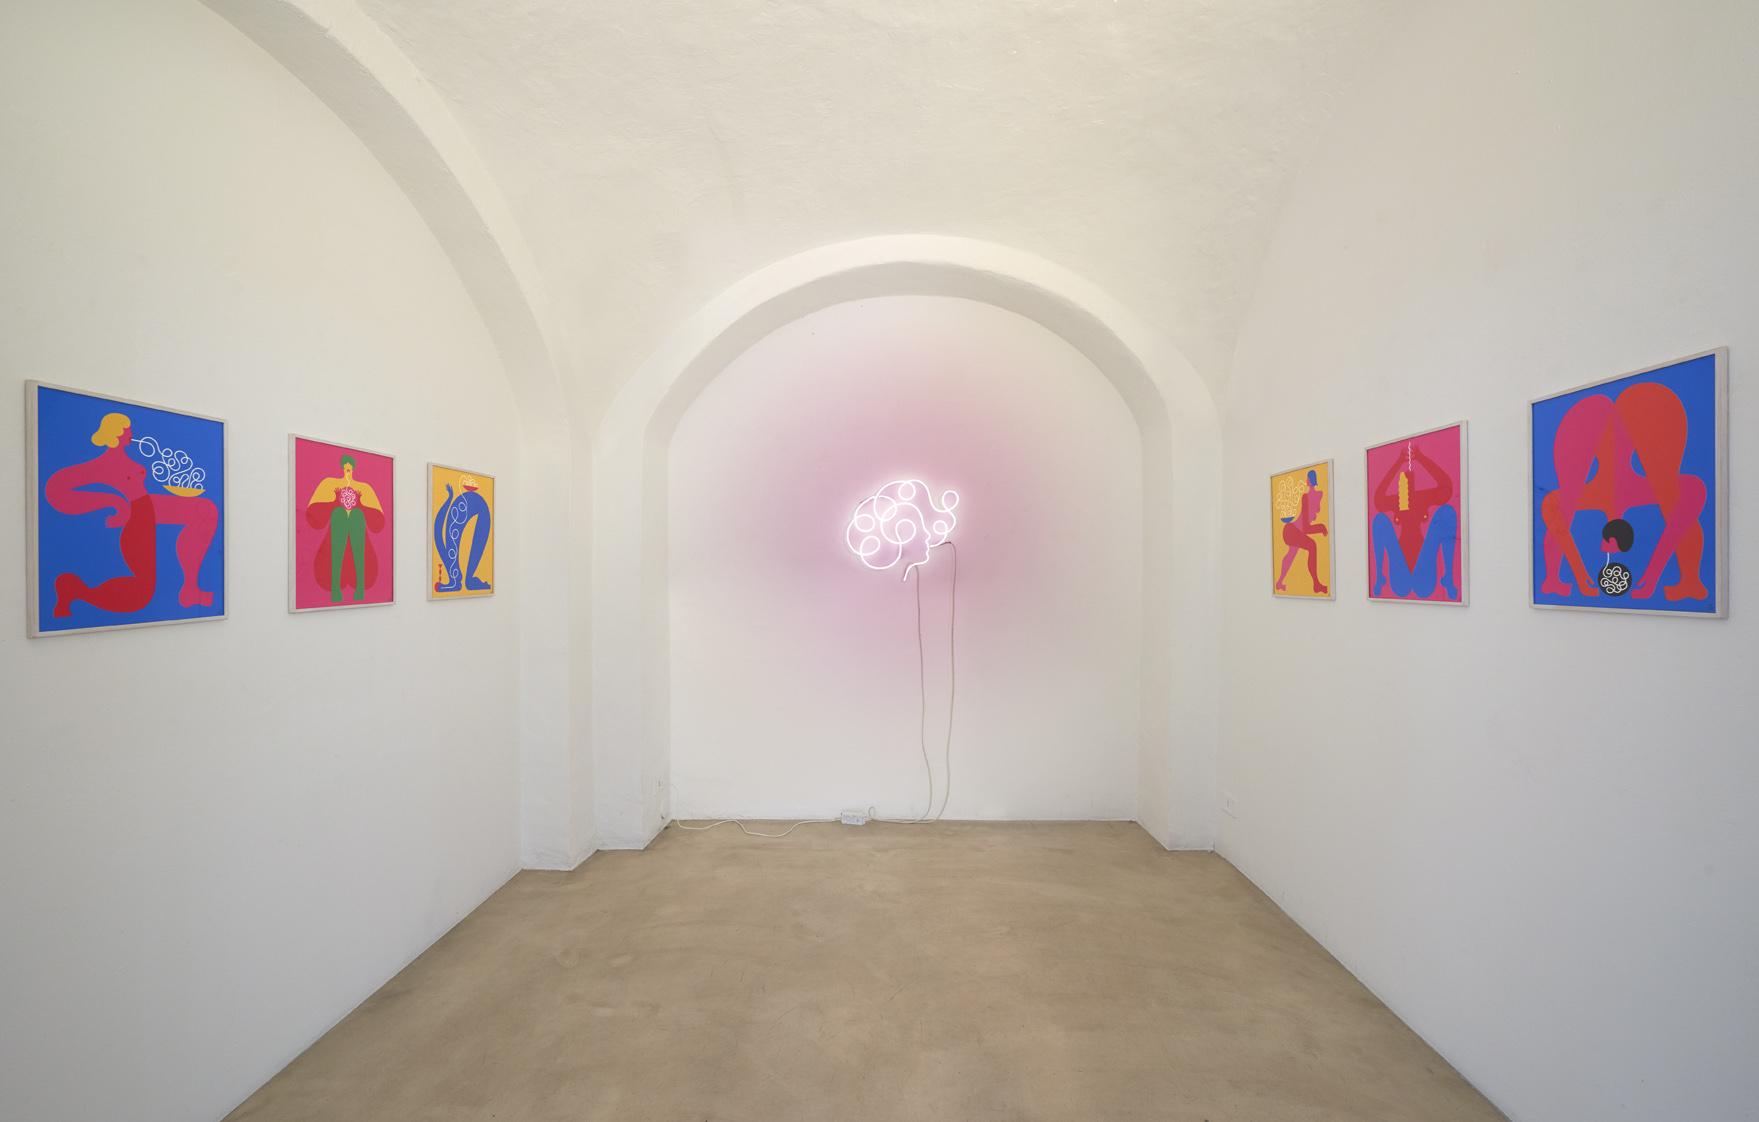 Olimpia Zagnoli, installation view